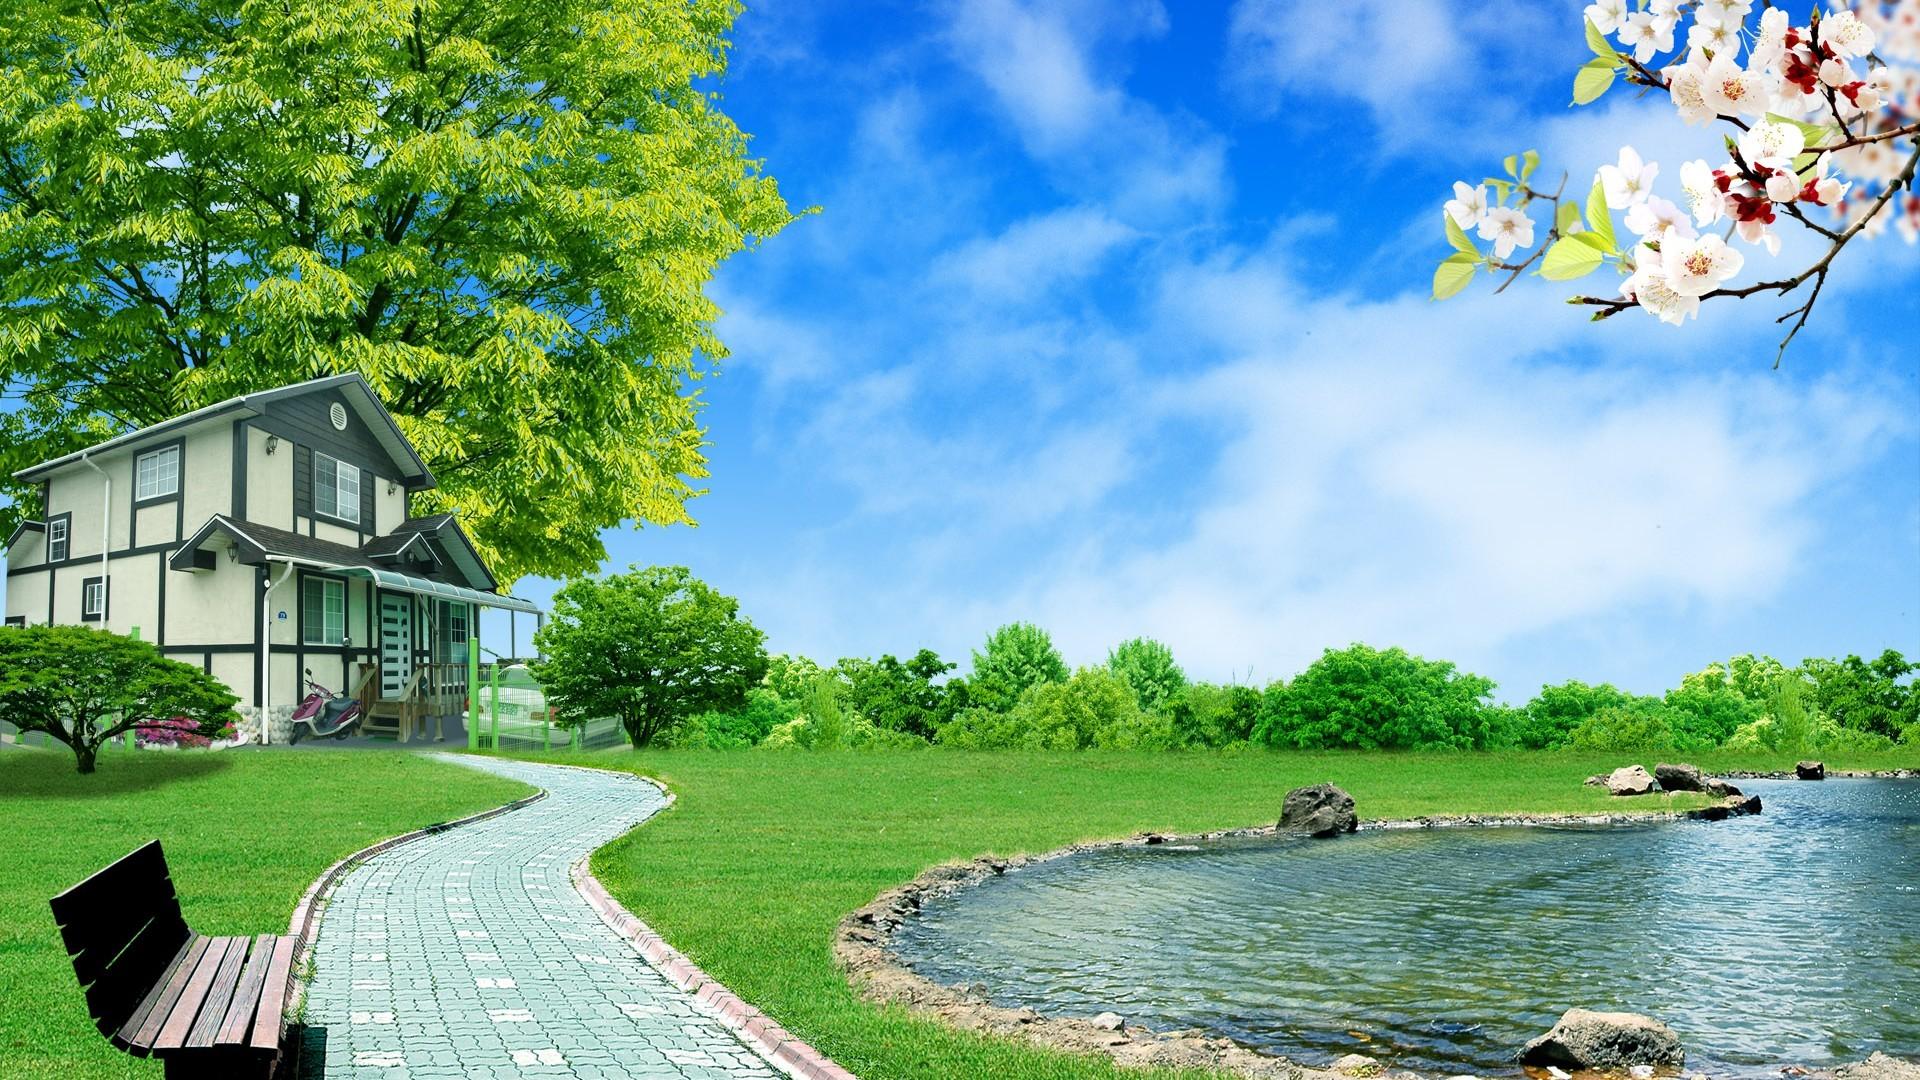 3D Nature Images Free Download   PixelsTalk Net